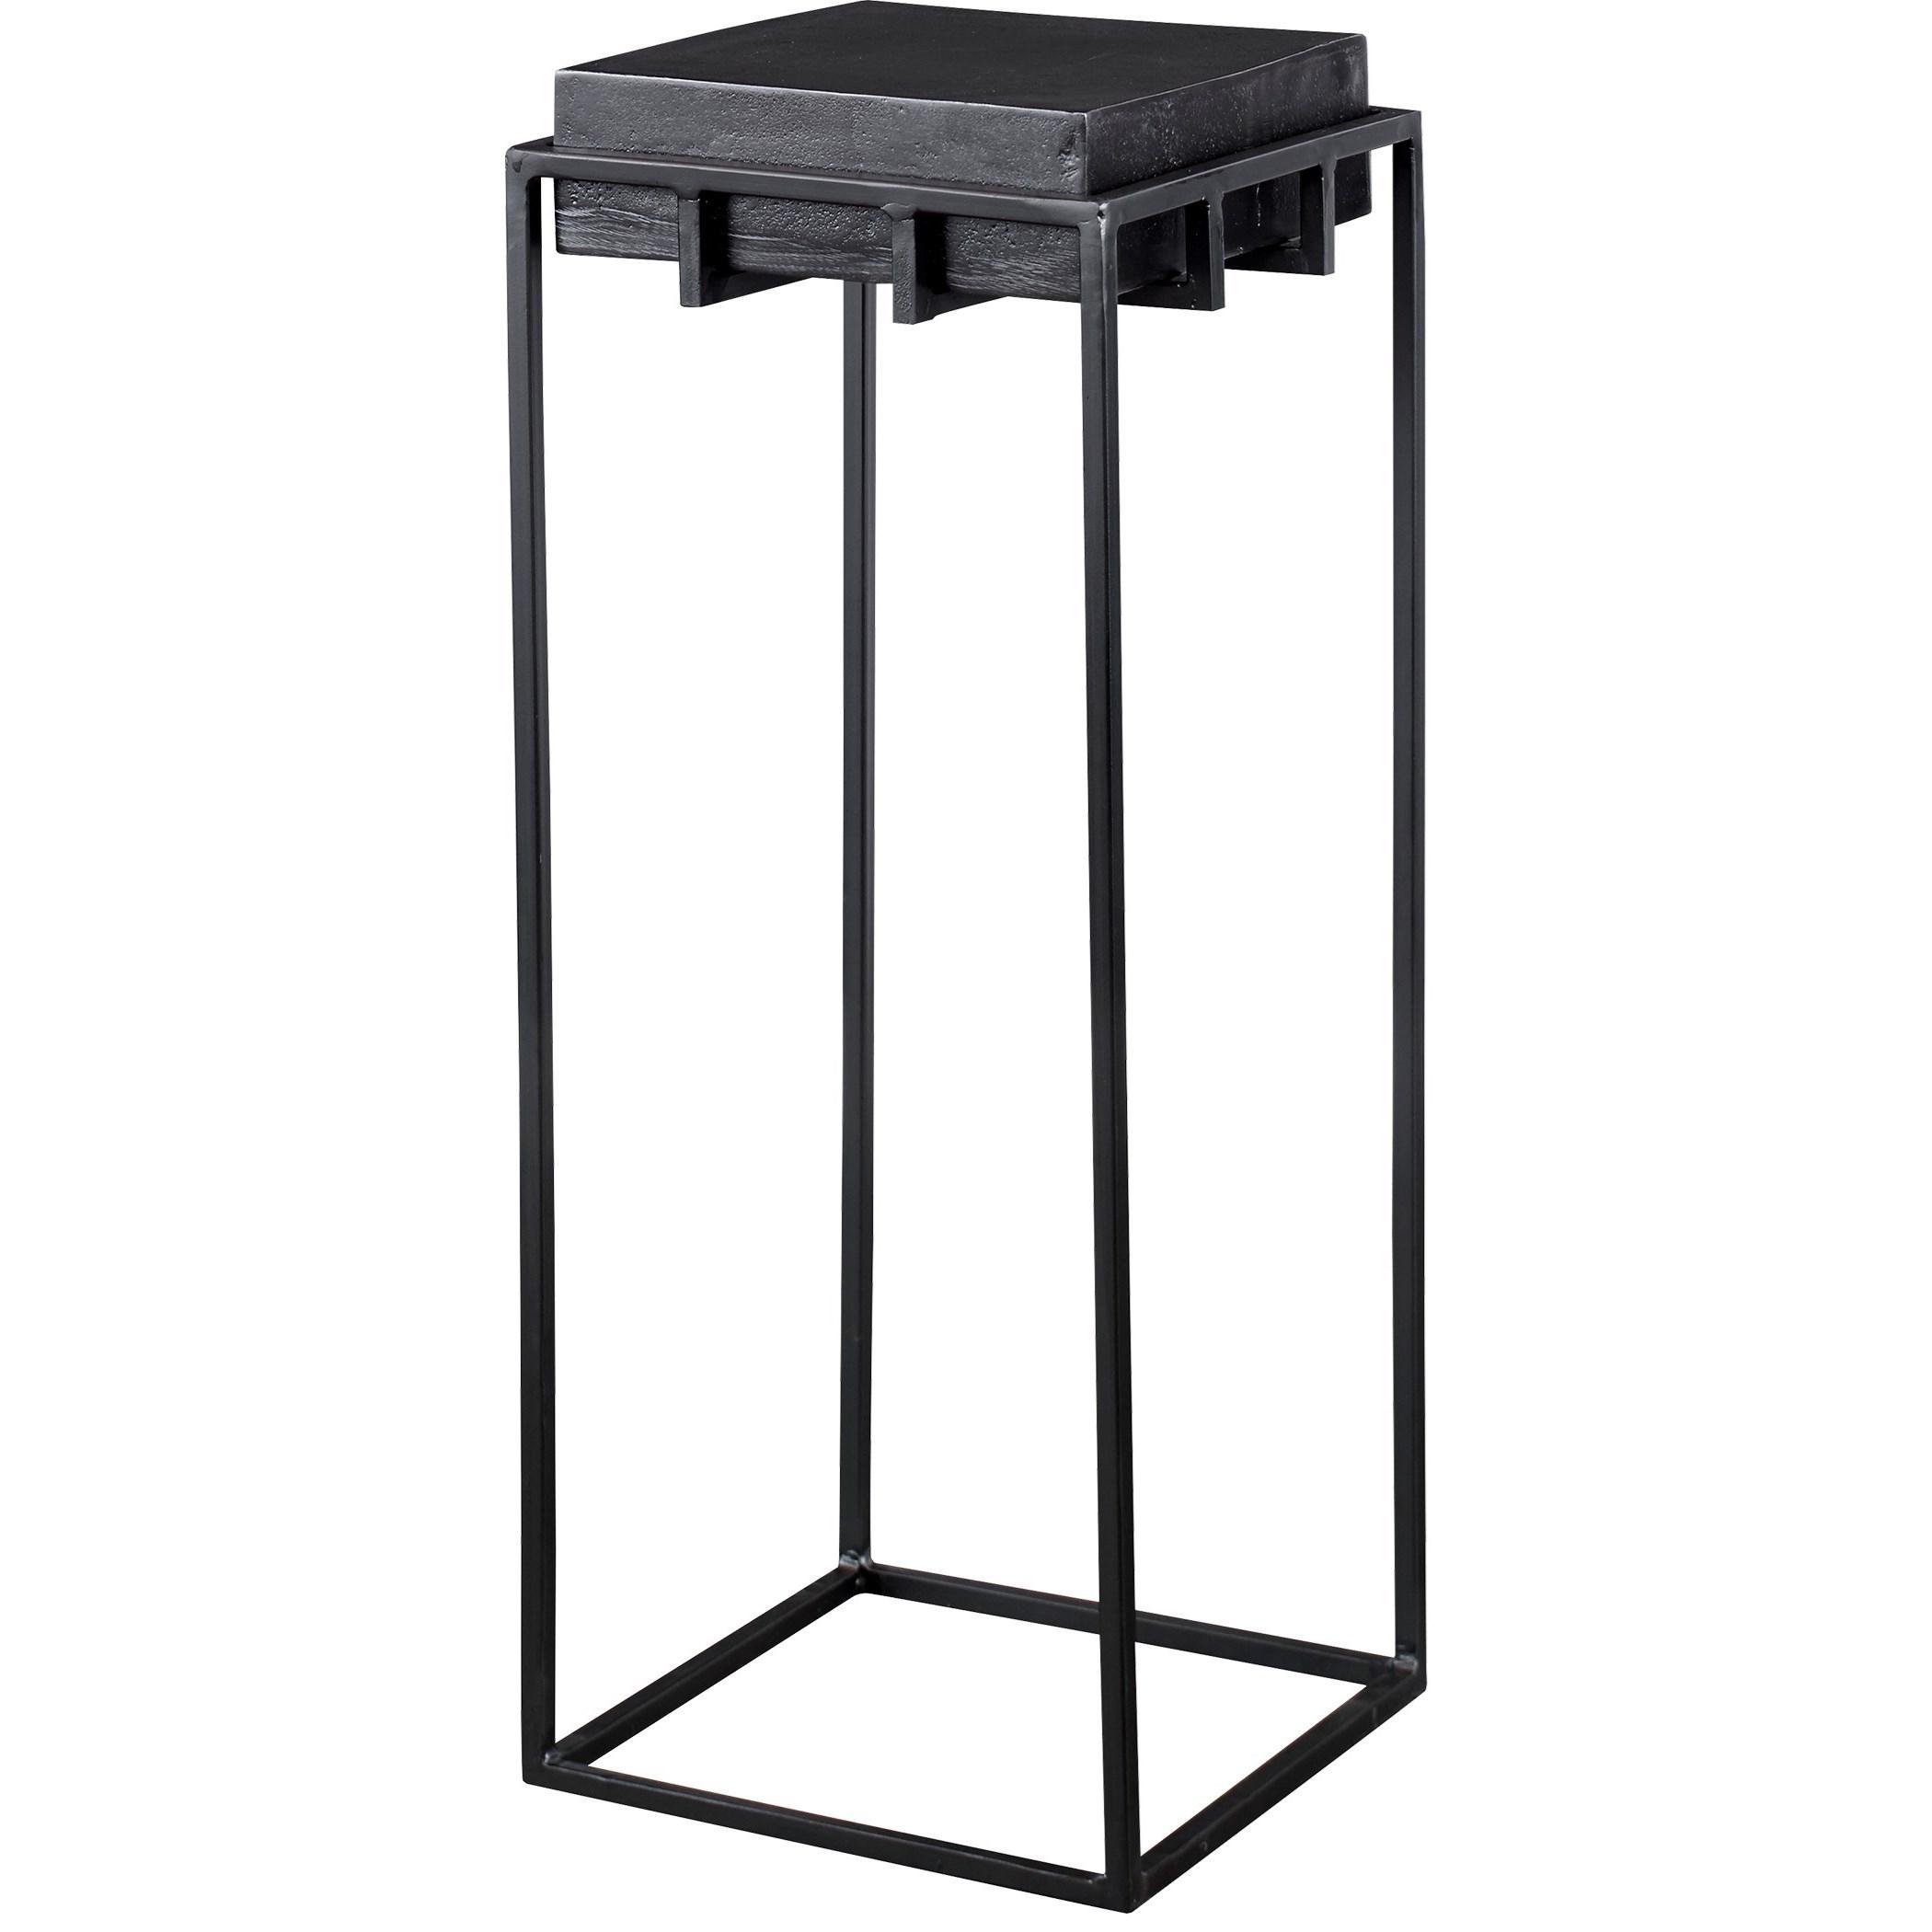 Telone Black Small Pedestal